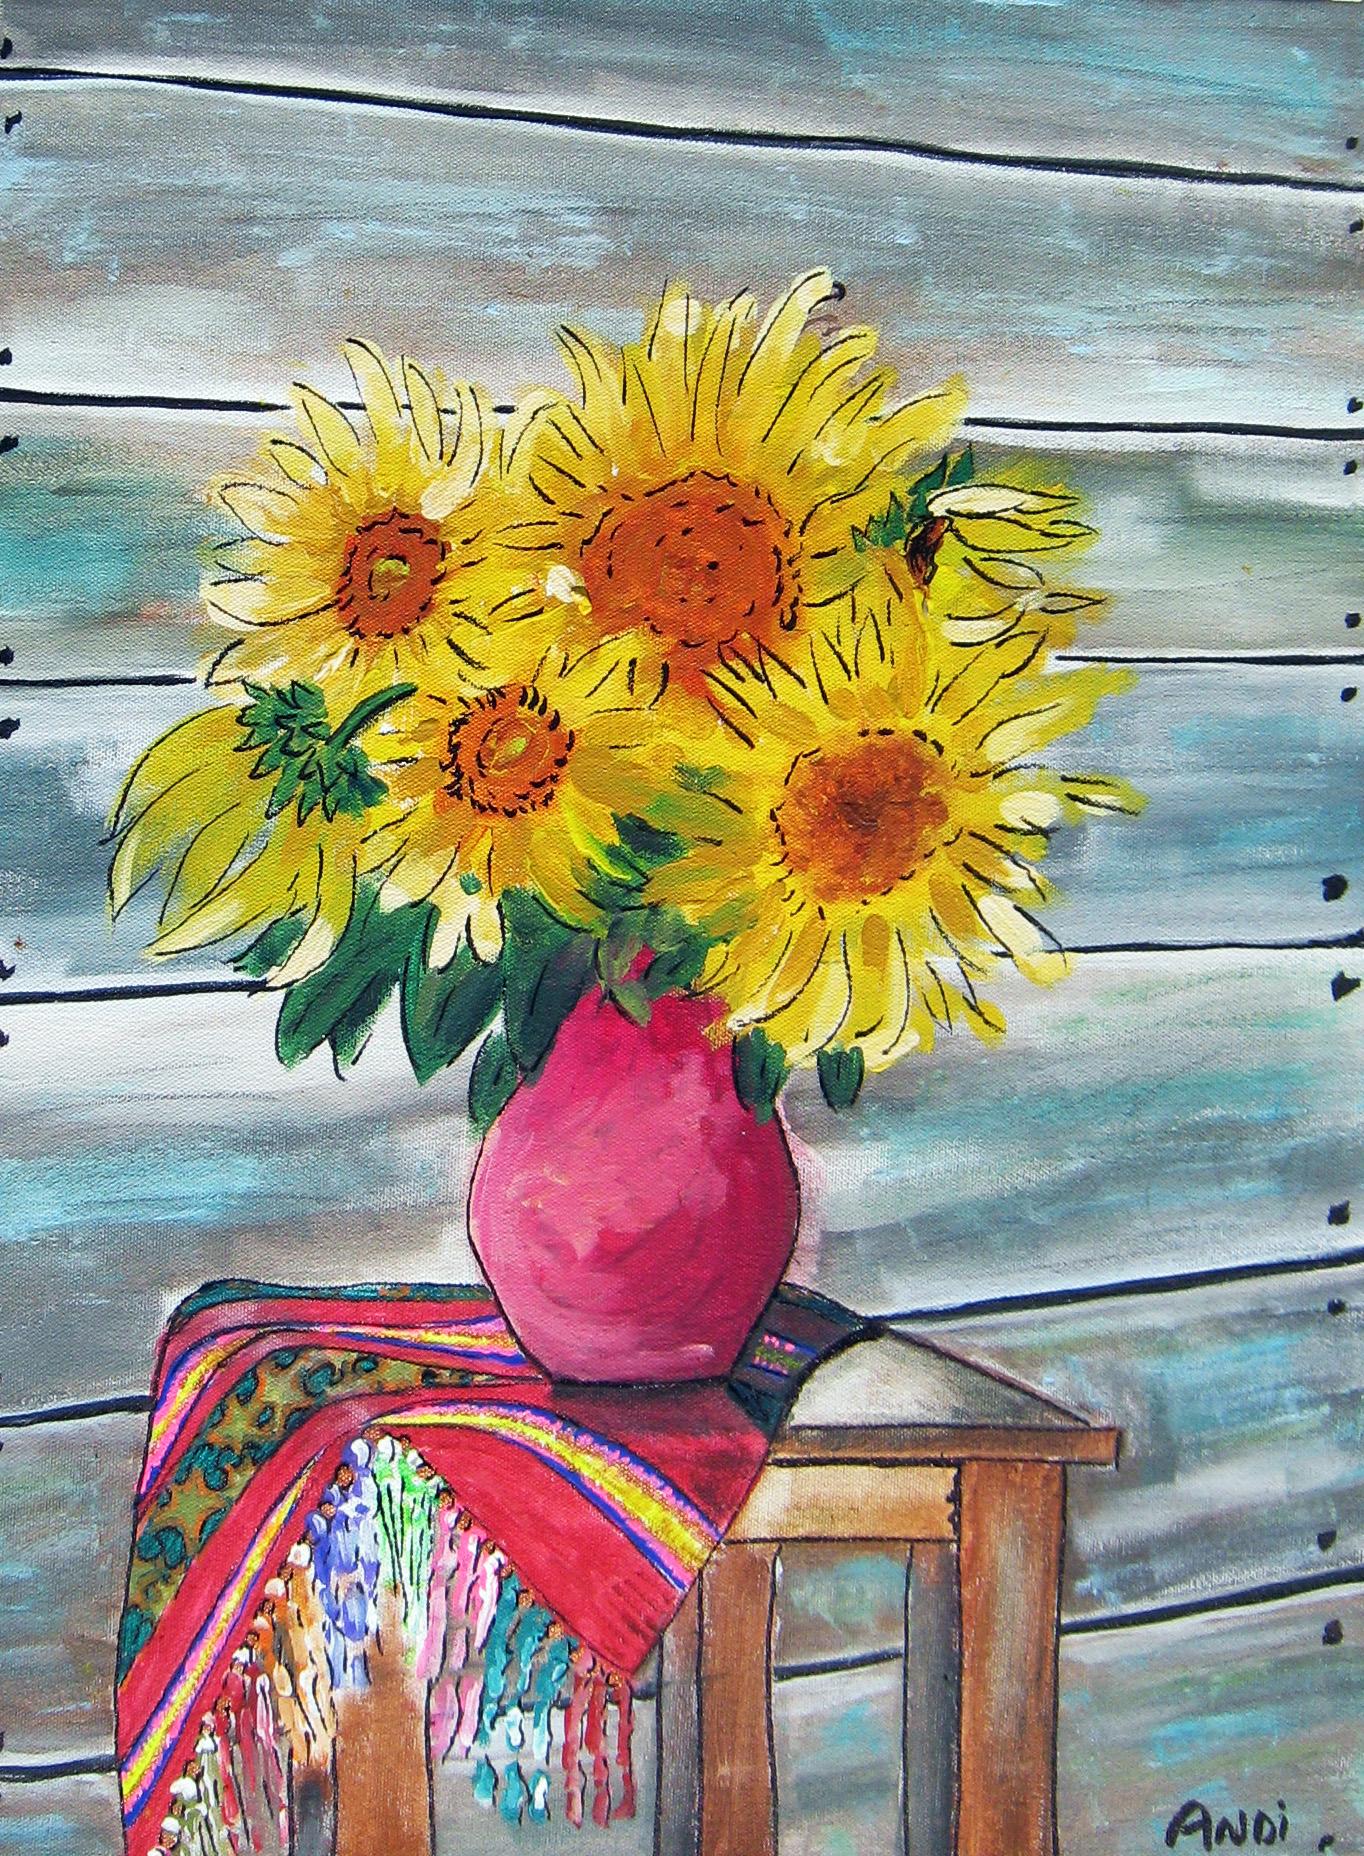 Sunflowers and Serape